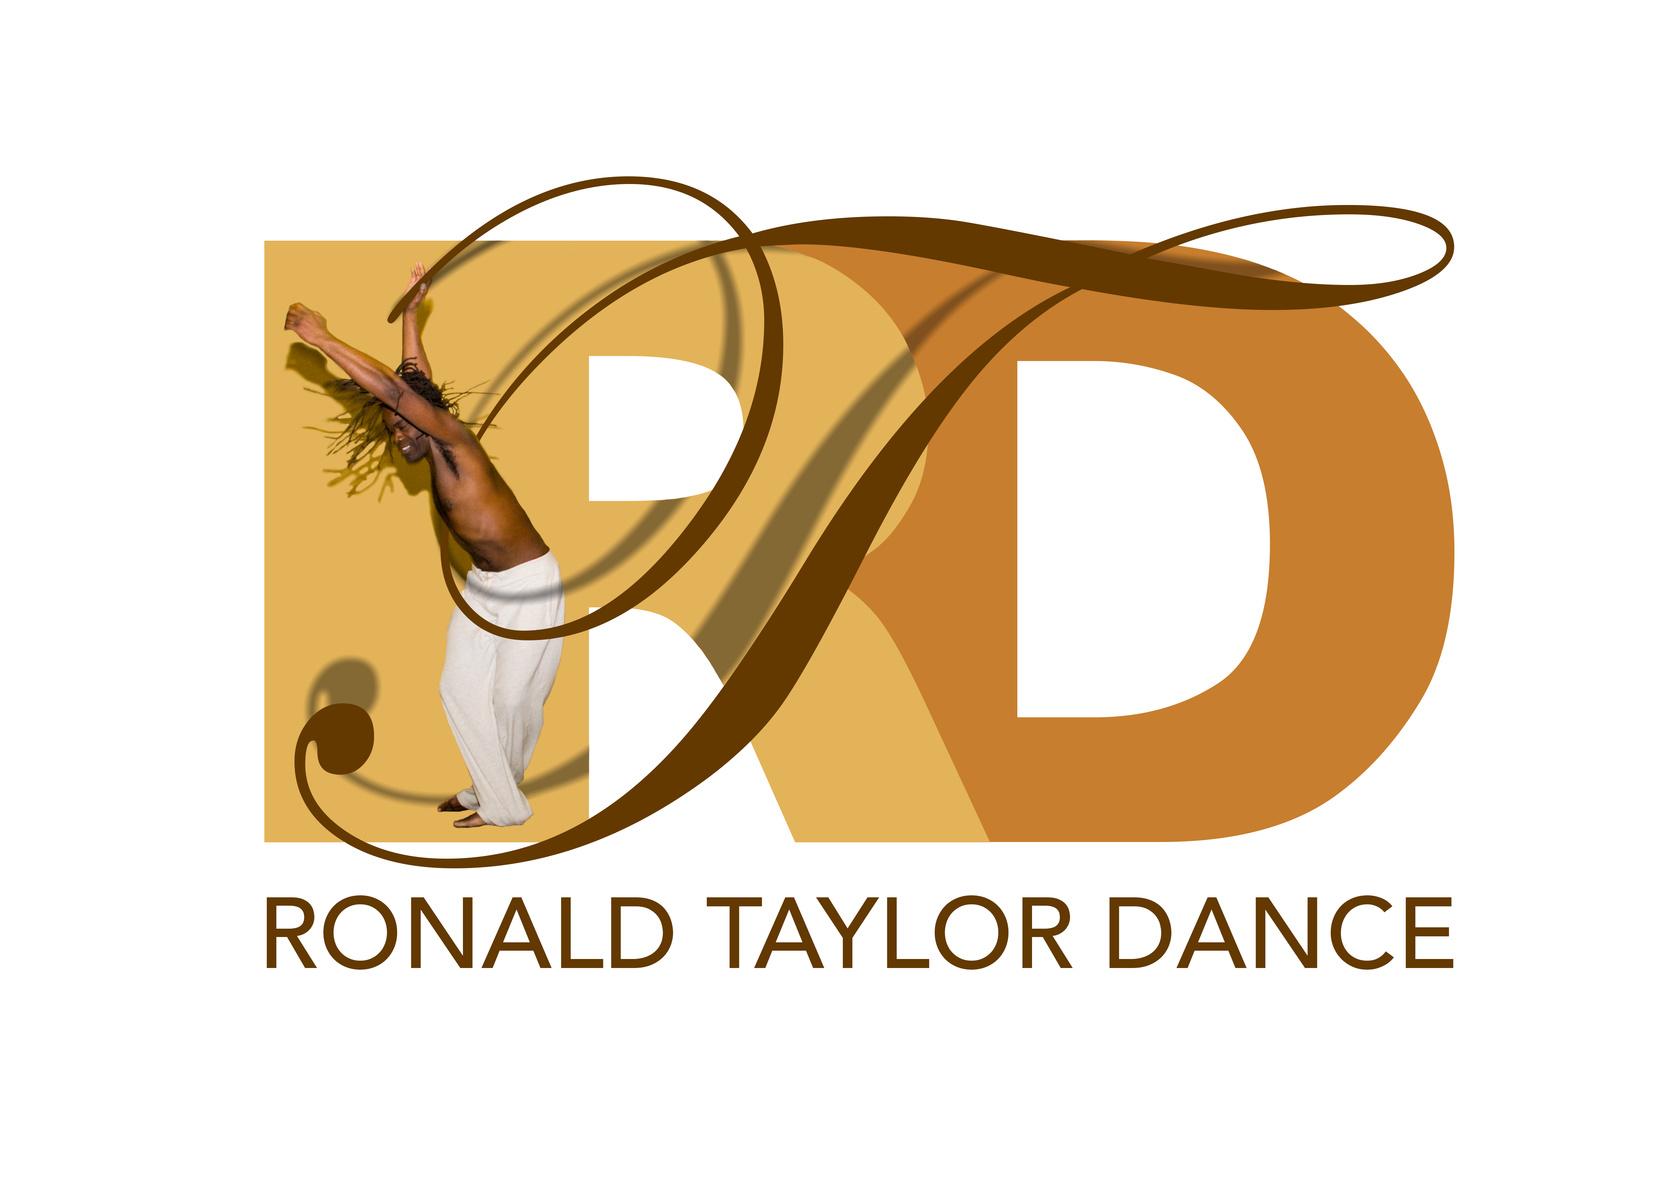 Ronald Taylor Dance